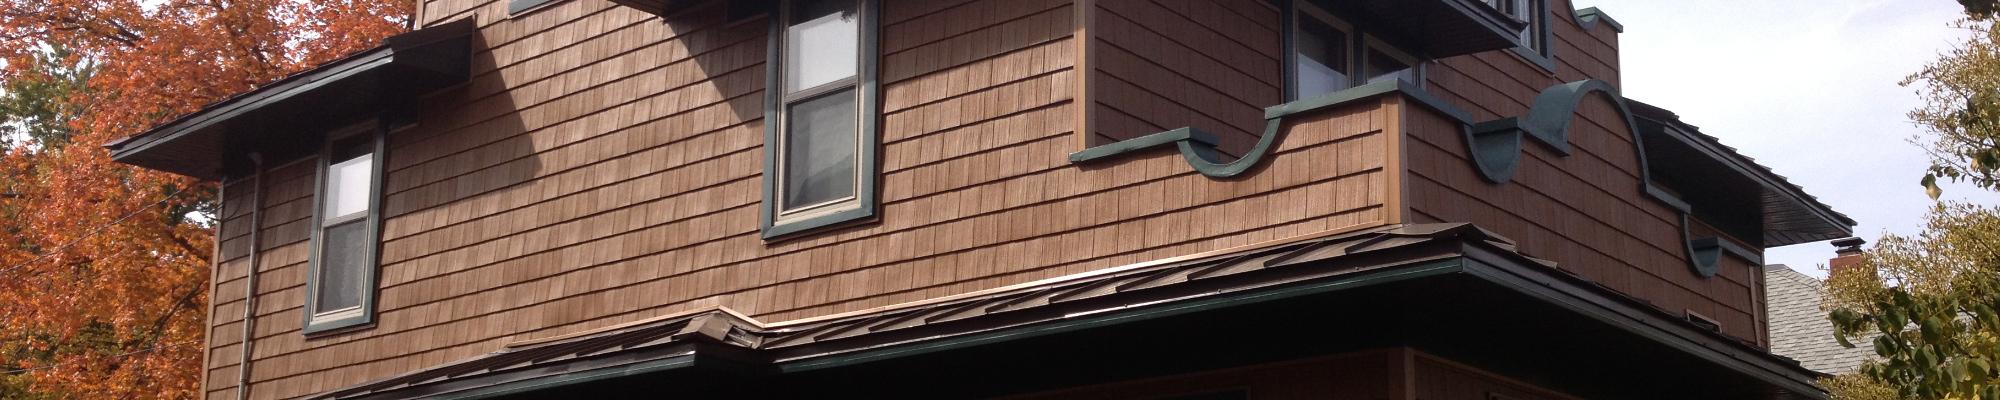 Stevens Point Vinyl Siding Contractor